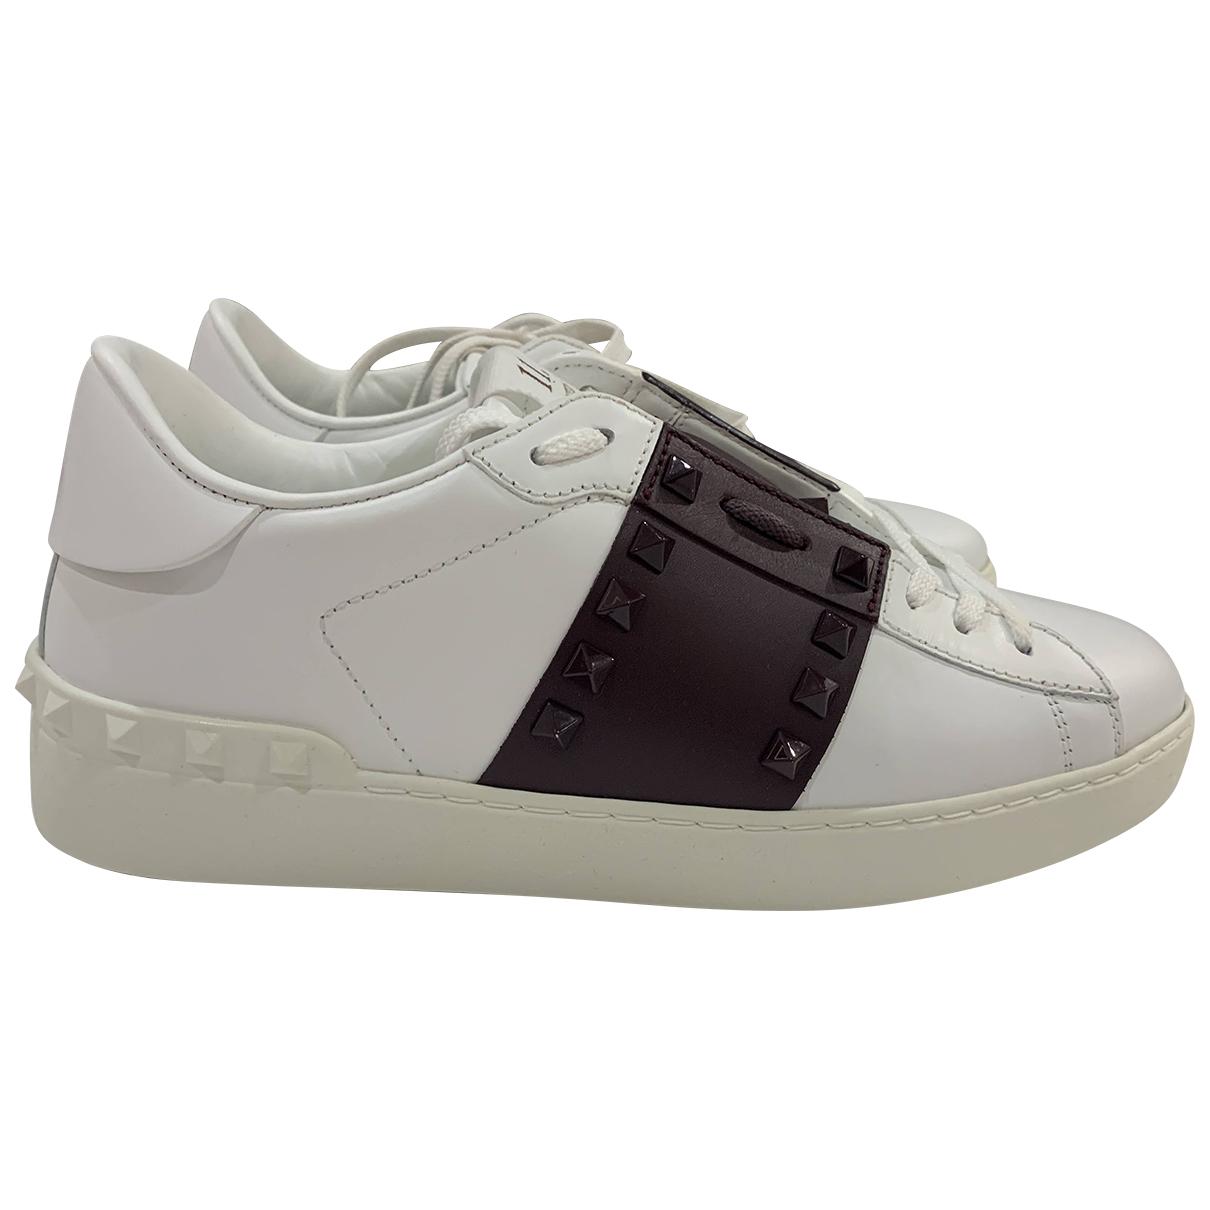 Valentino Garavani Rockstud Sneakers in  Weiss Leder